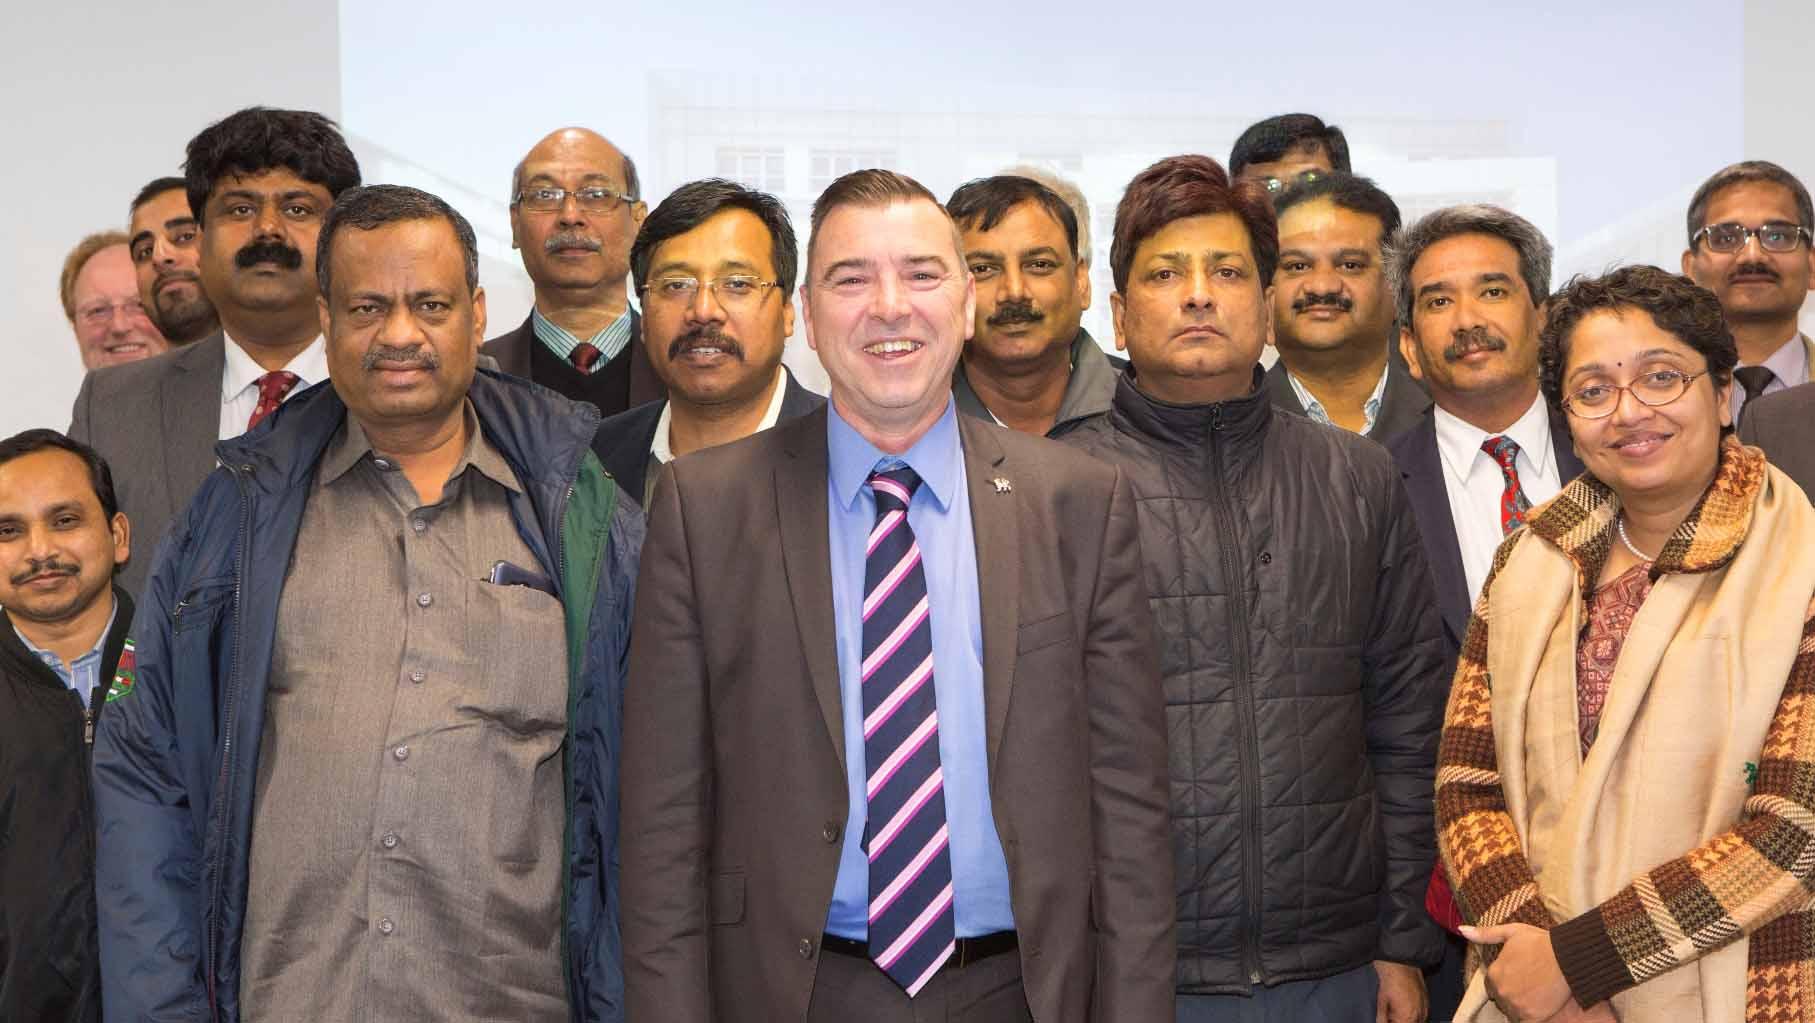 Indian Delegation at Birmingham City University (Centre - Professor Julian Beer)